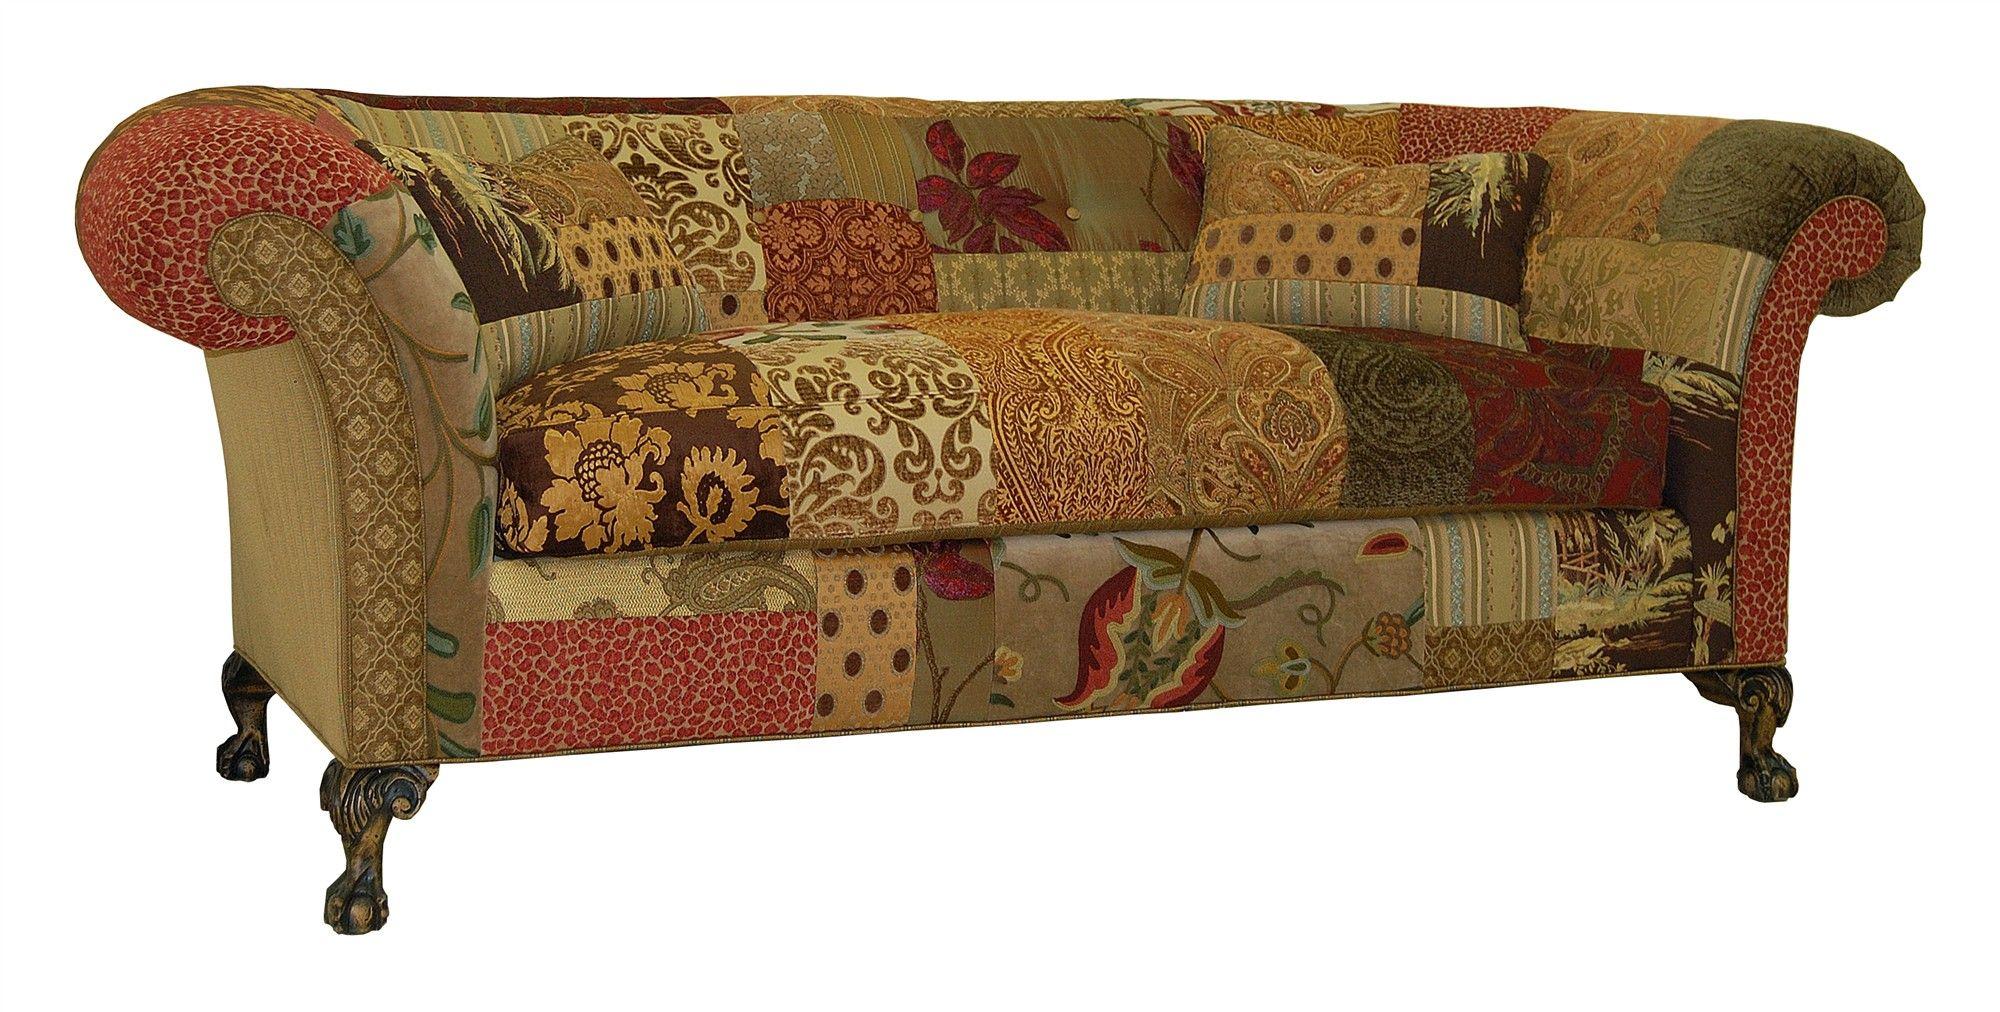 Jeffrey Zimmerman Furniture The Jeff Collection Bronson Tufted Back Sofa Kcf